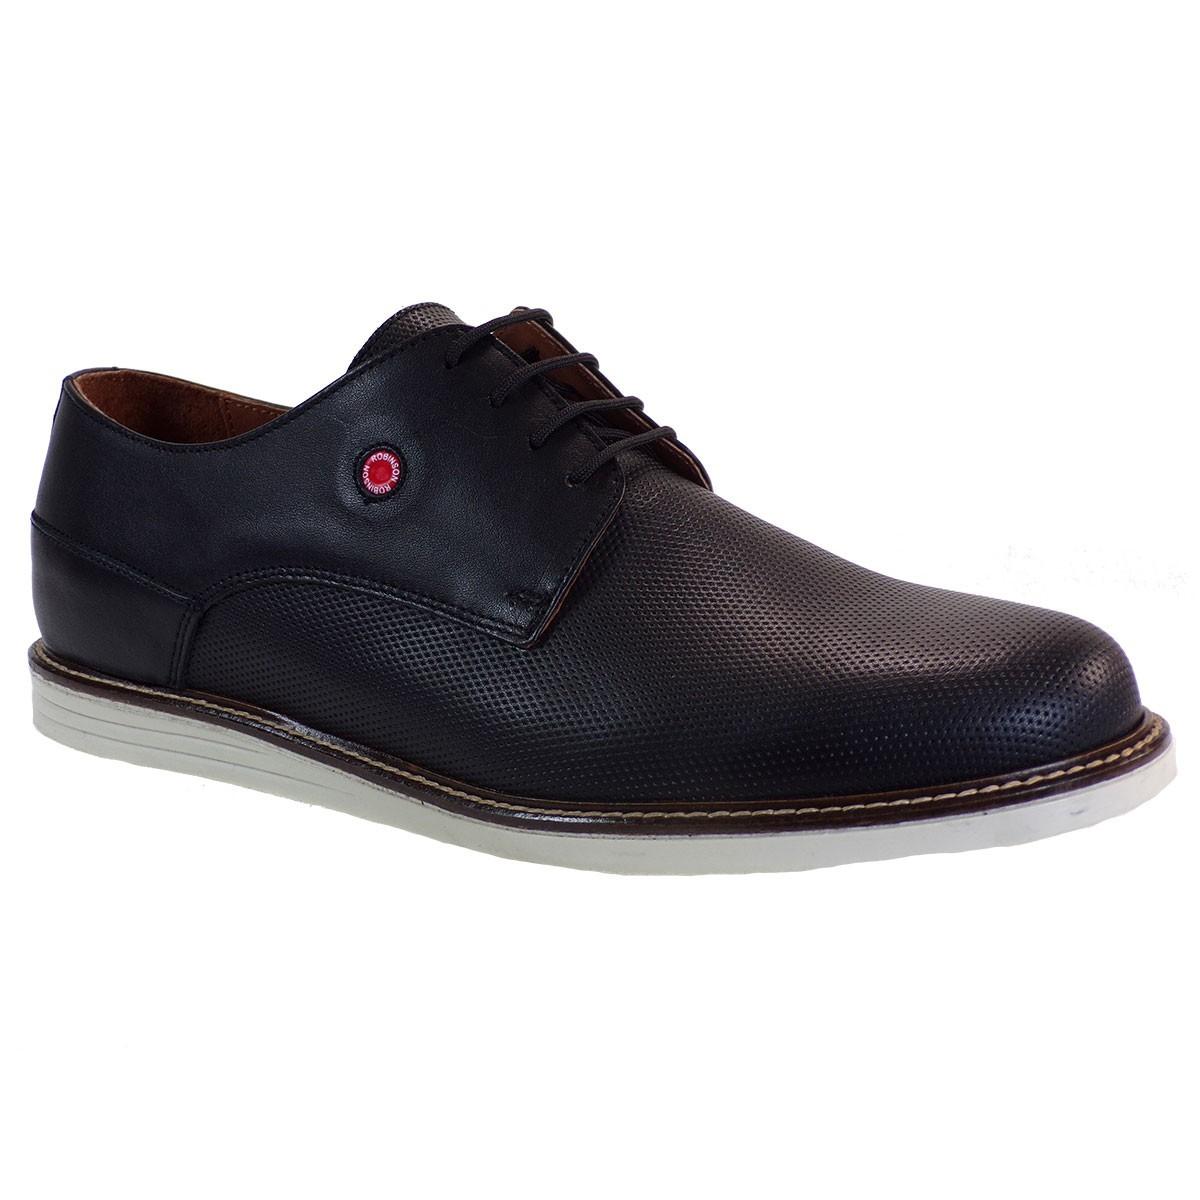 Robinson Ανδρικά Παπούτσια 1927 Mαύρο Δέρμα